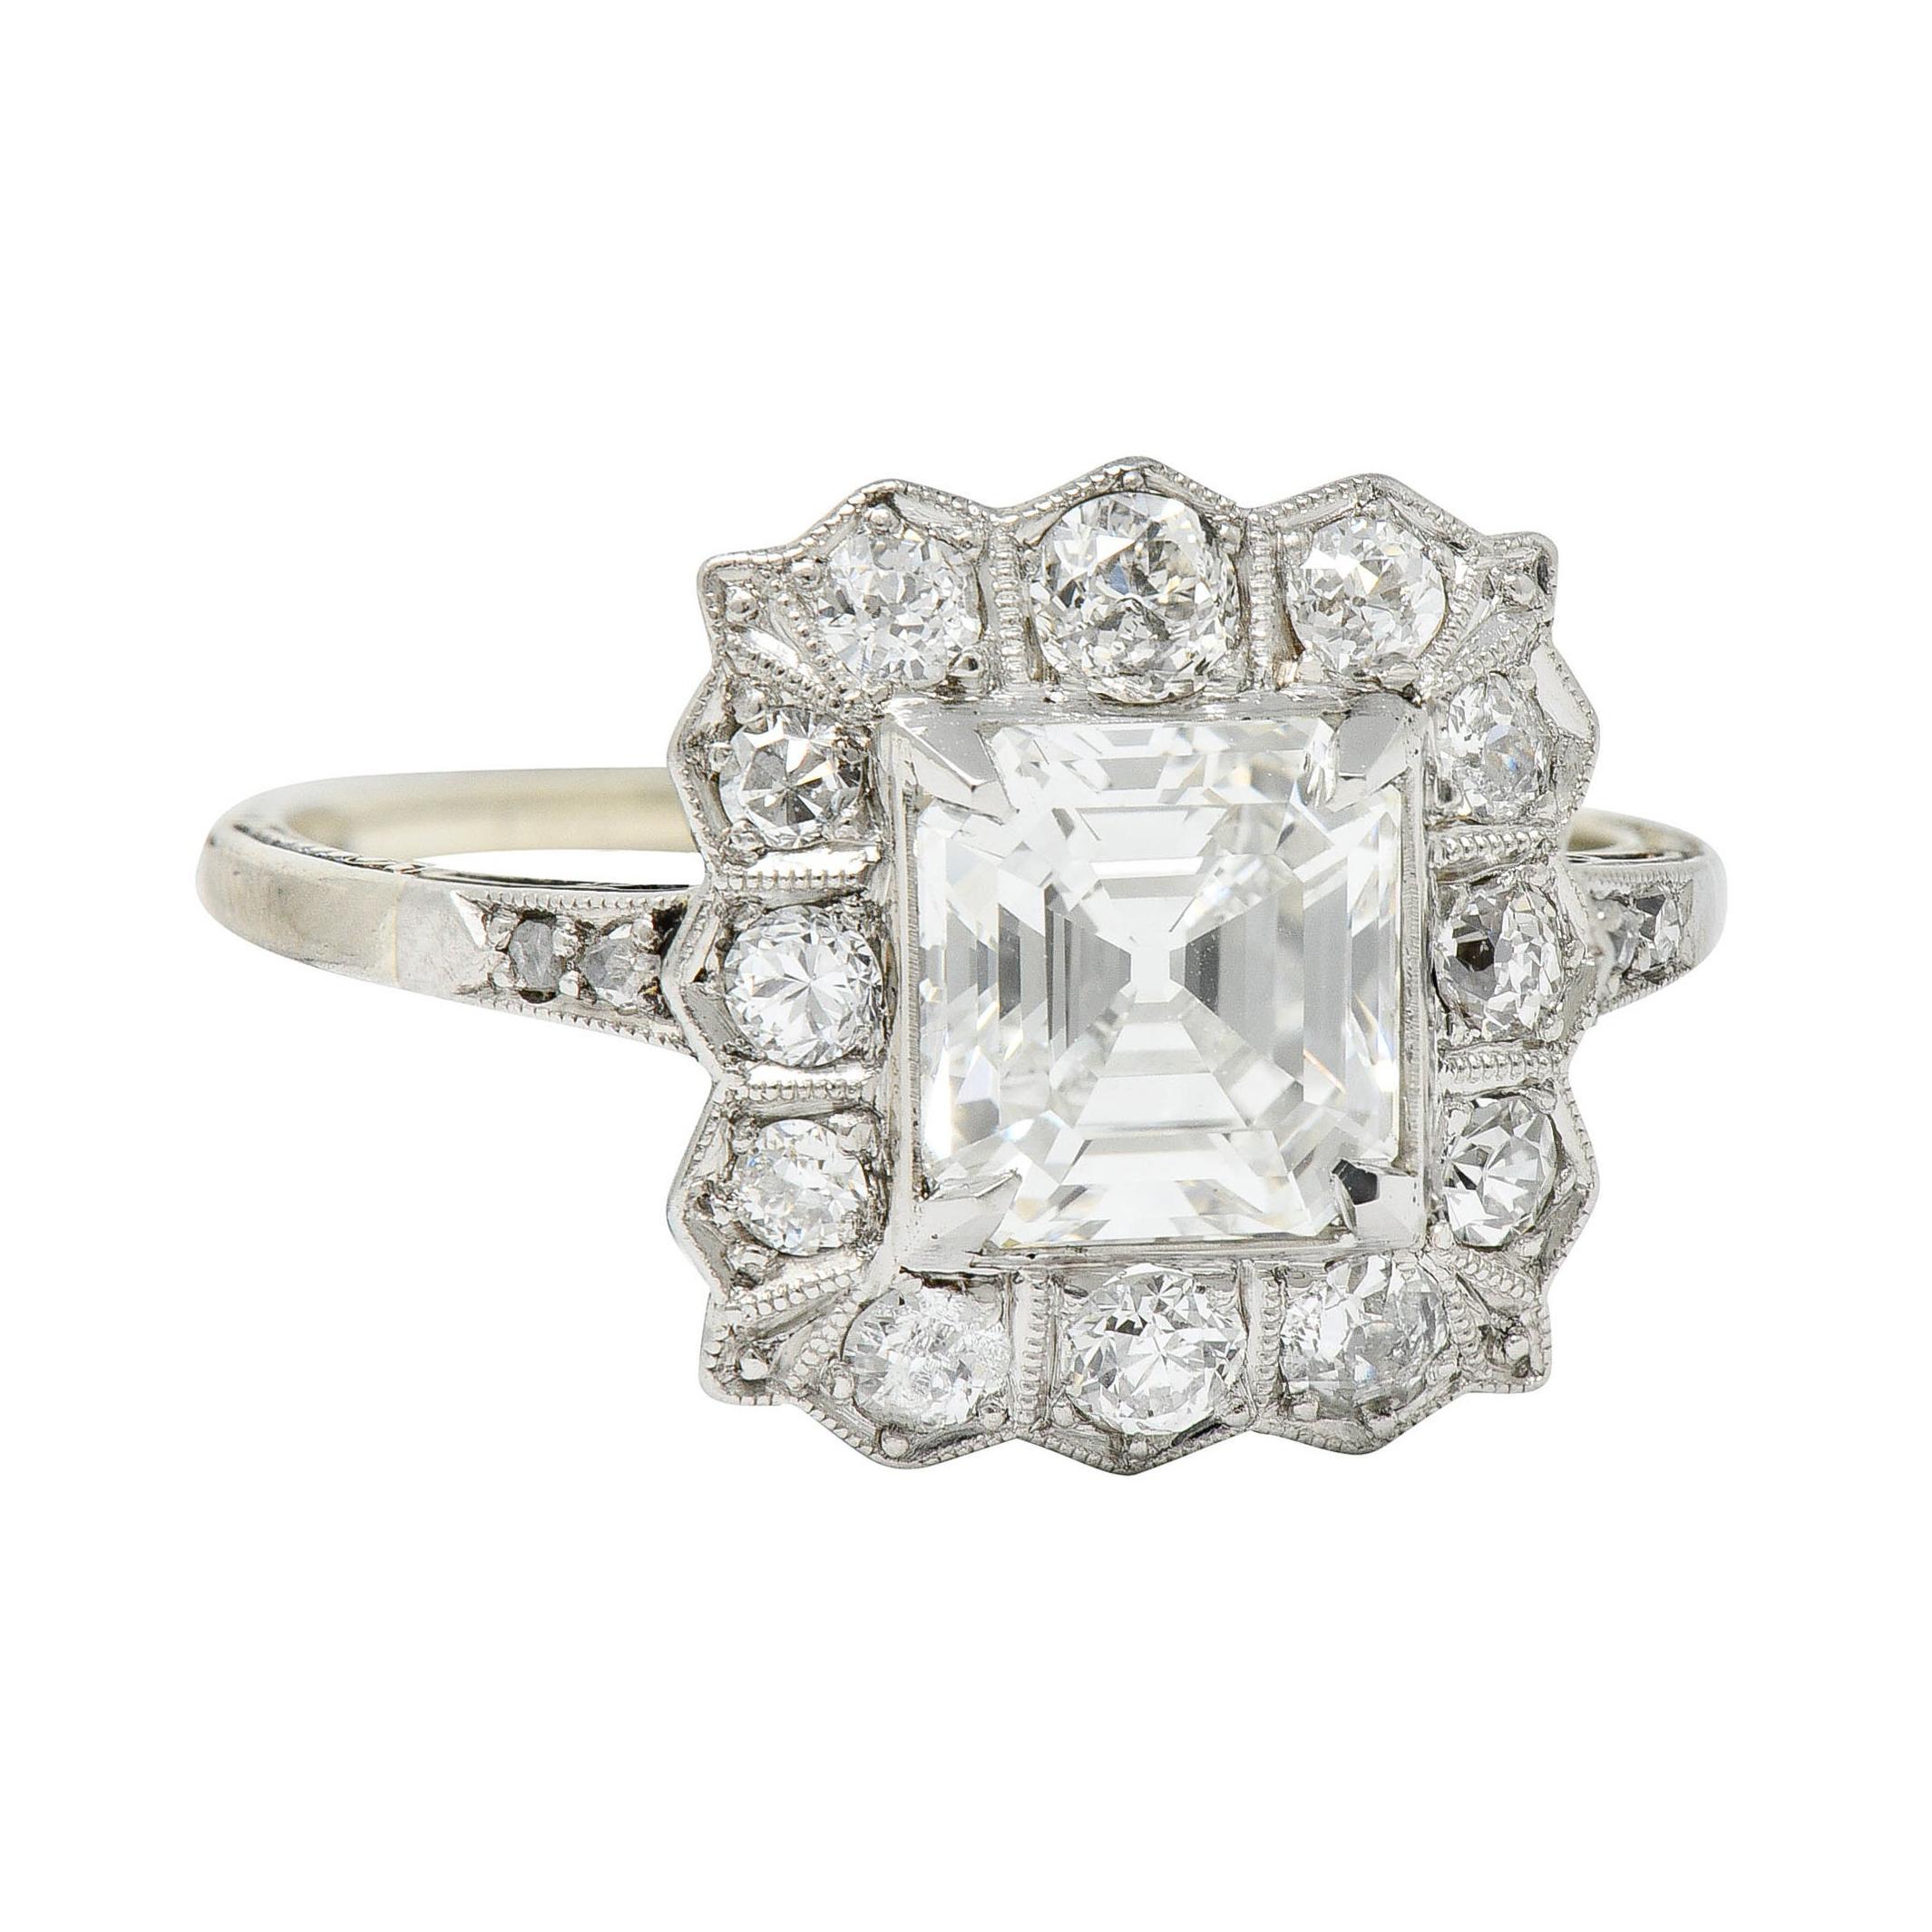 Edwardian 2.07 Carats Asscher Diamond Platinum-Topped 14 Karat Gold Cluster Ring